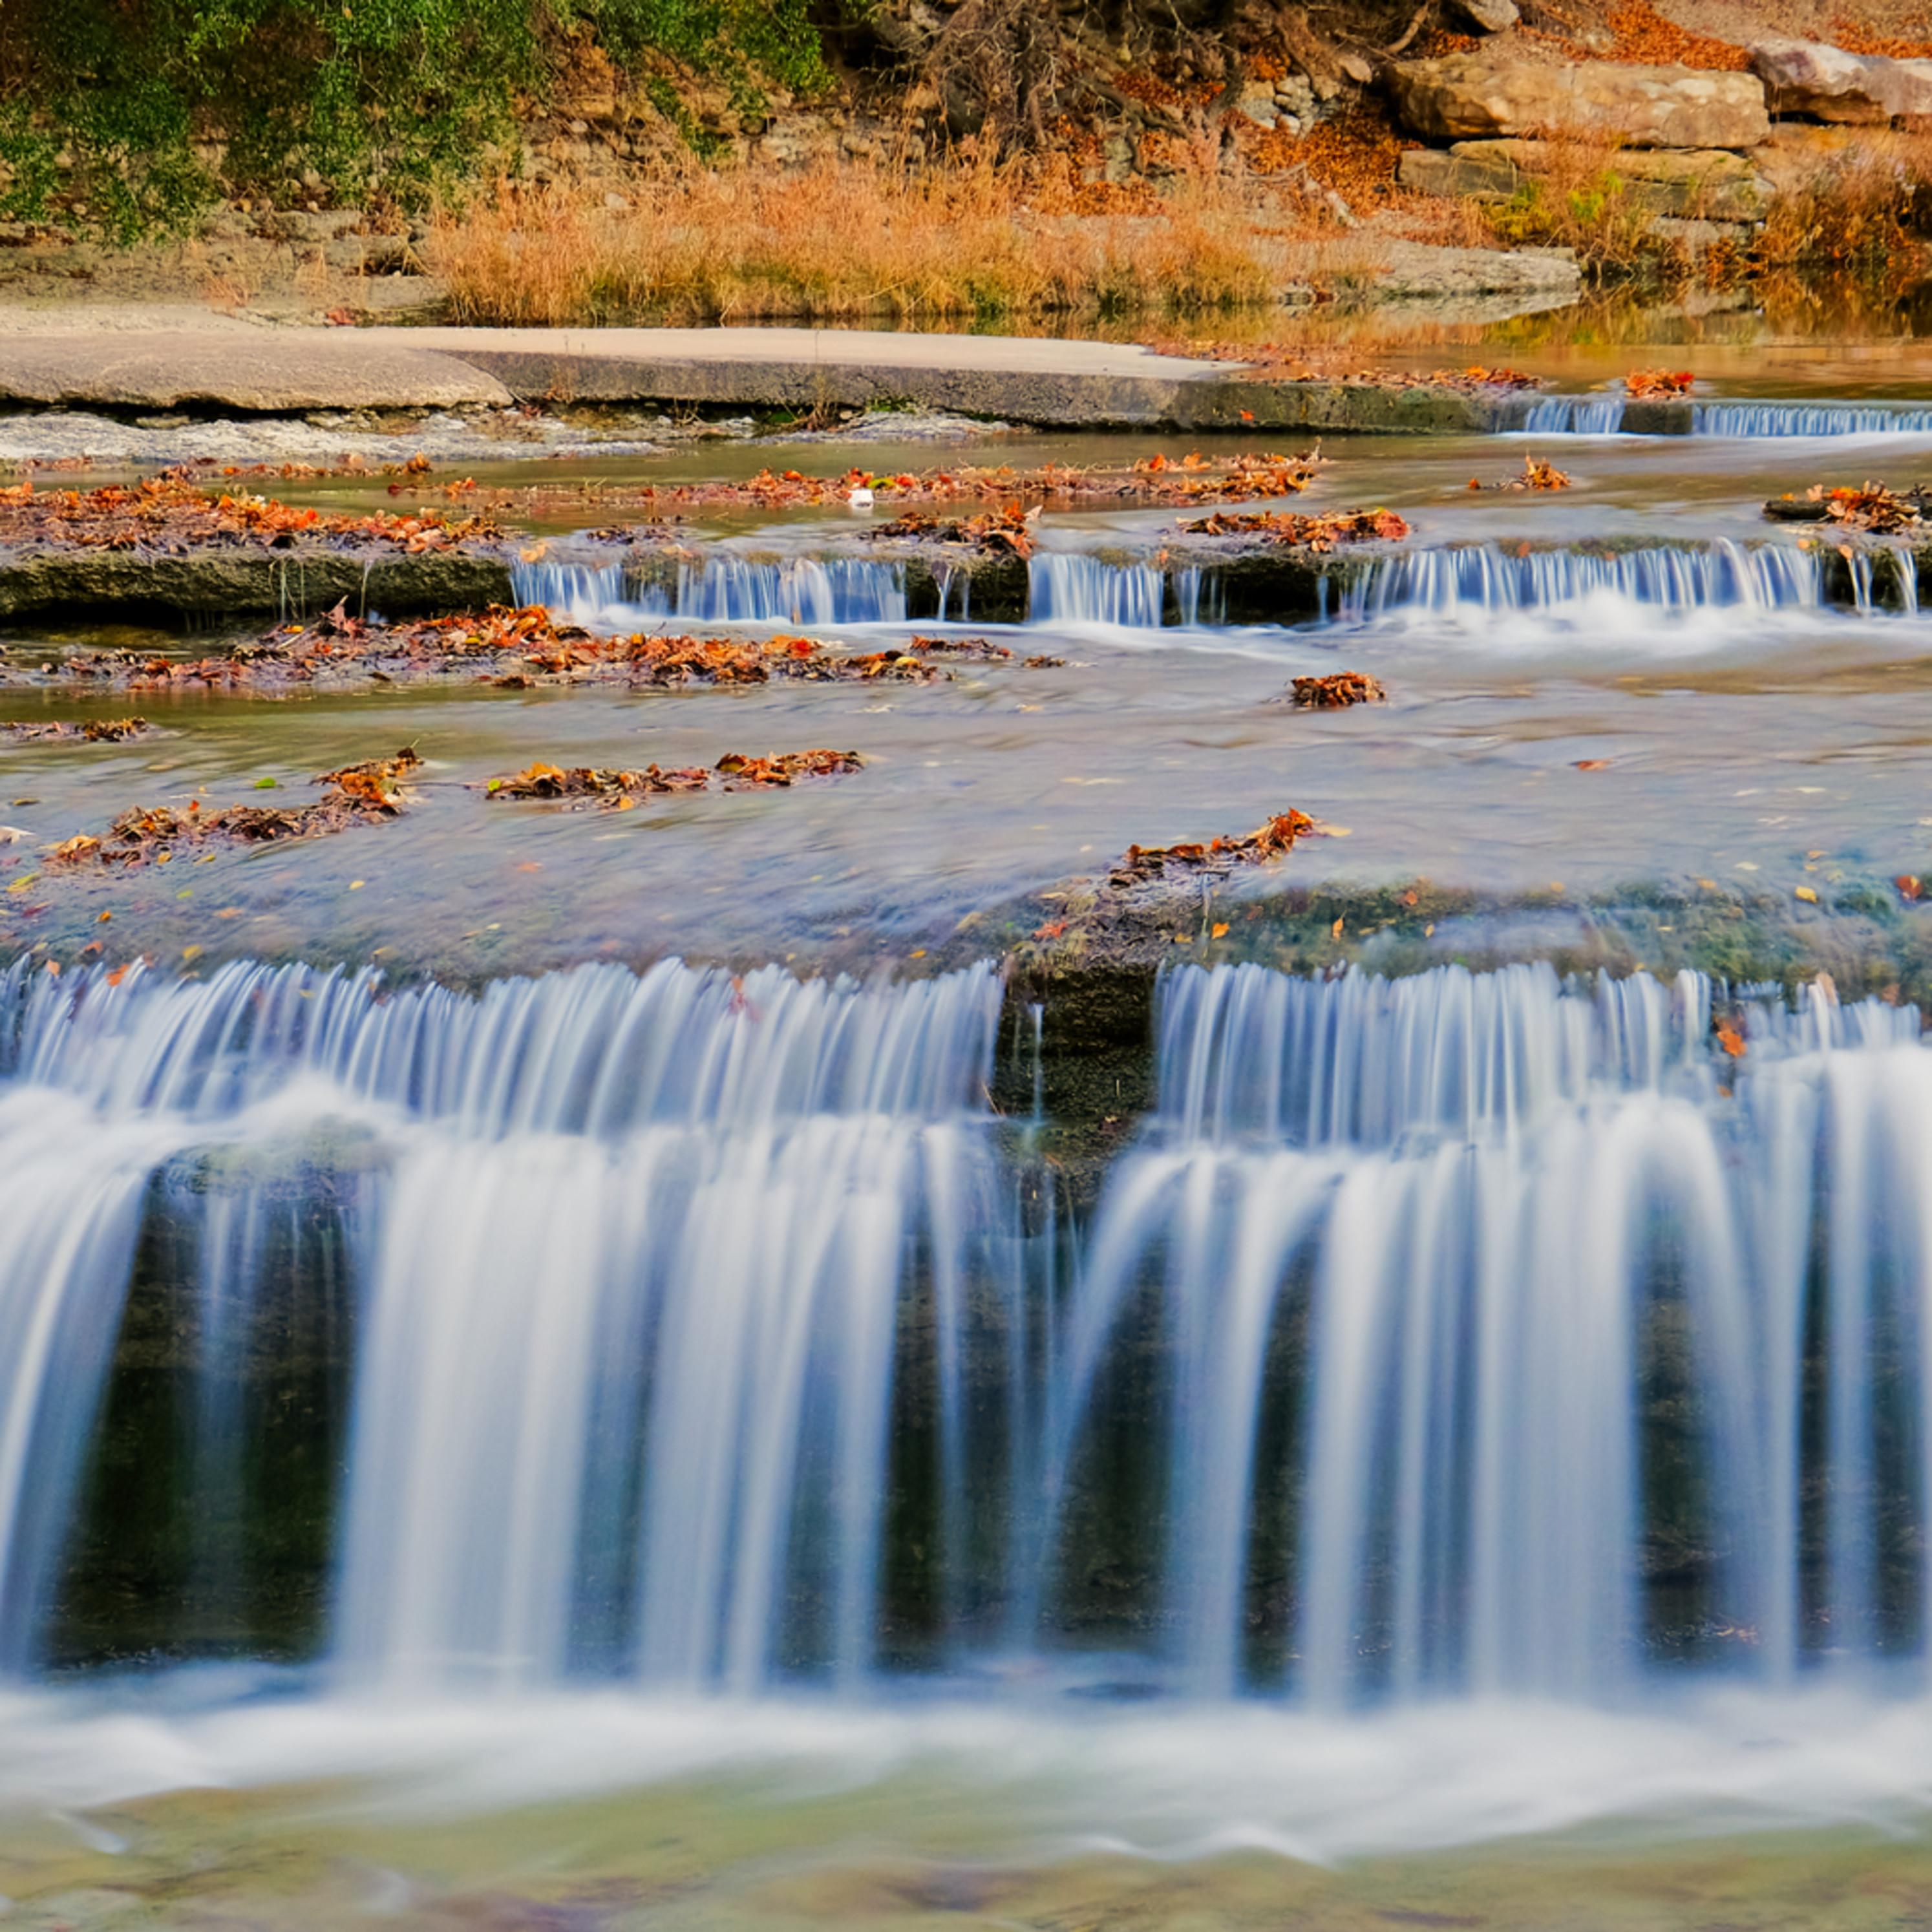 Waterfalls 48 iigwqi